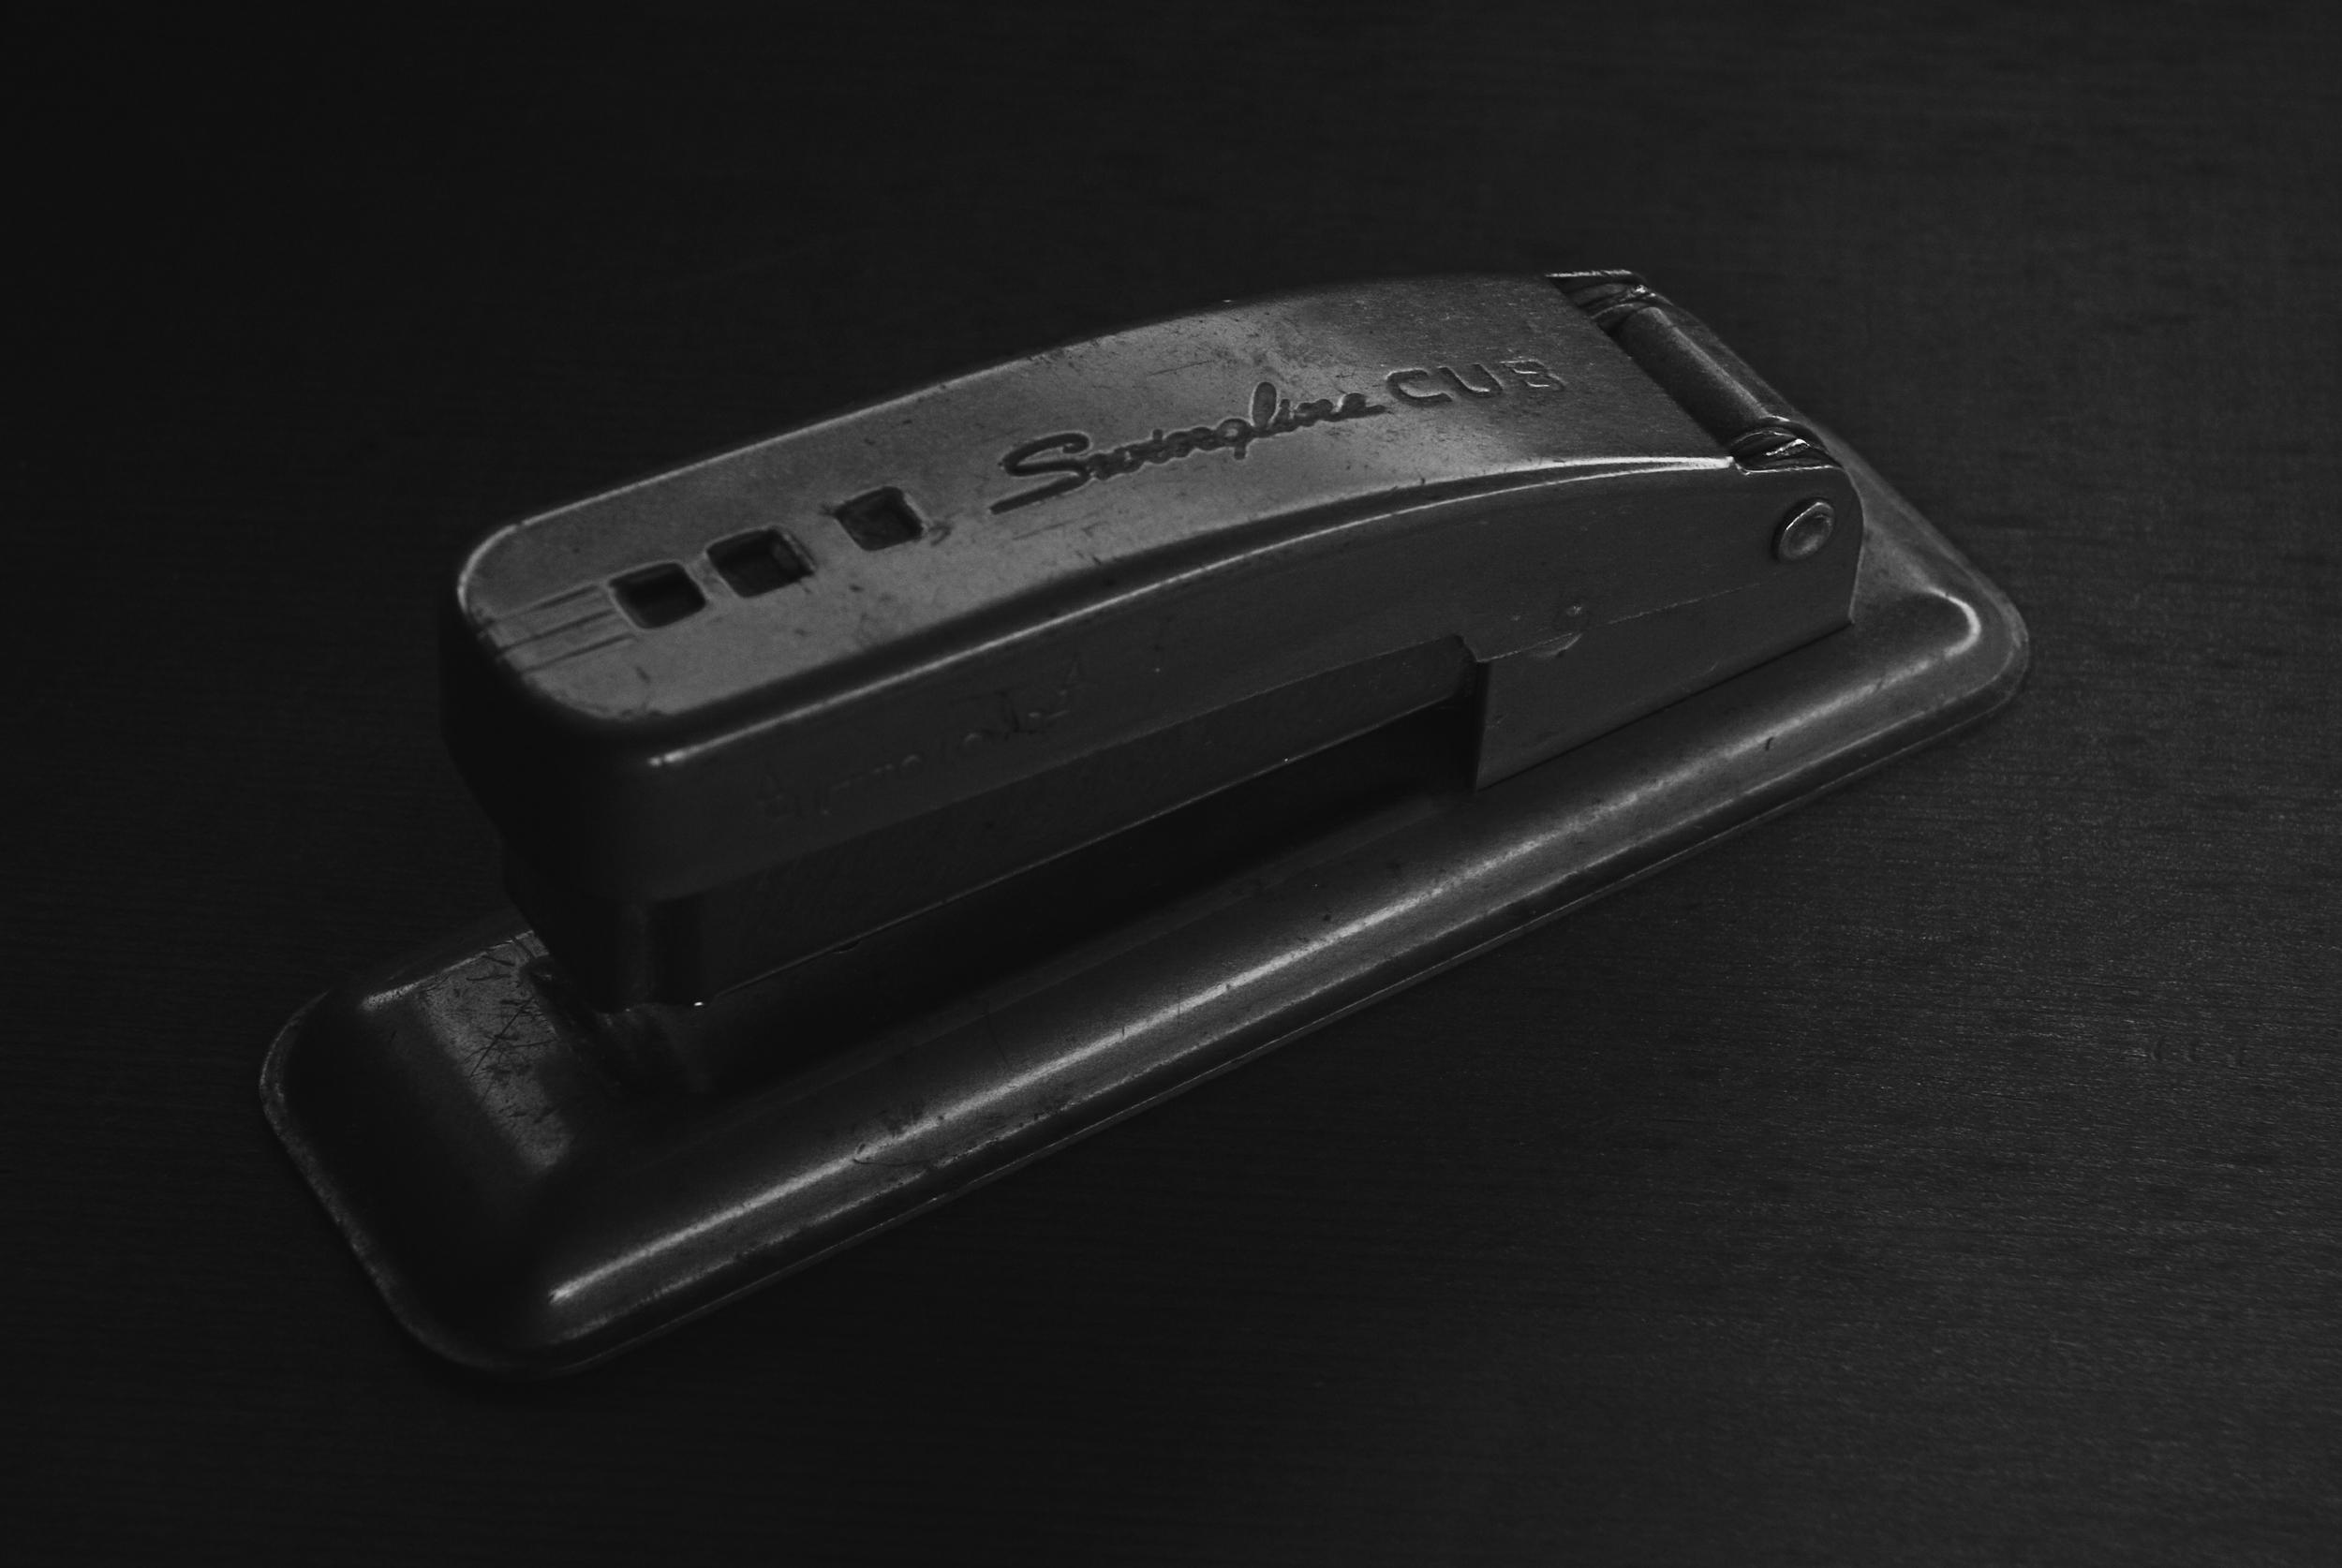 Random stapler found in Grandpa's house